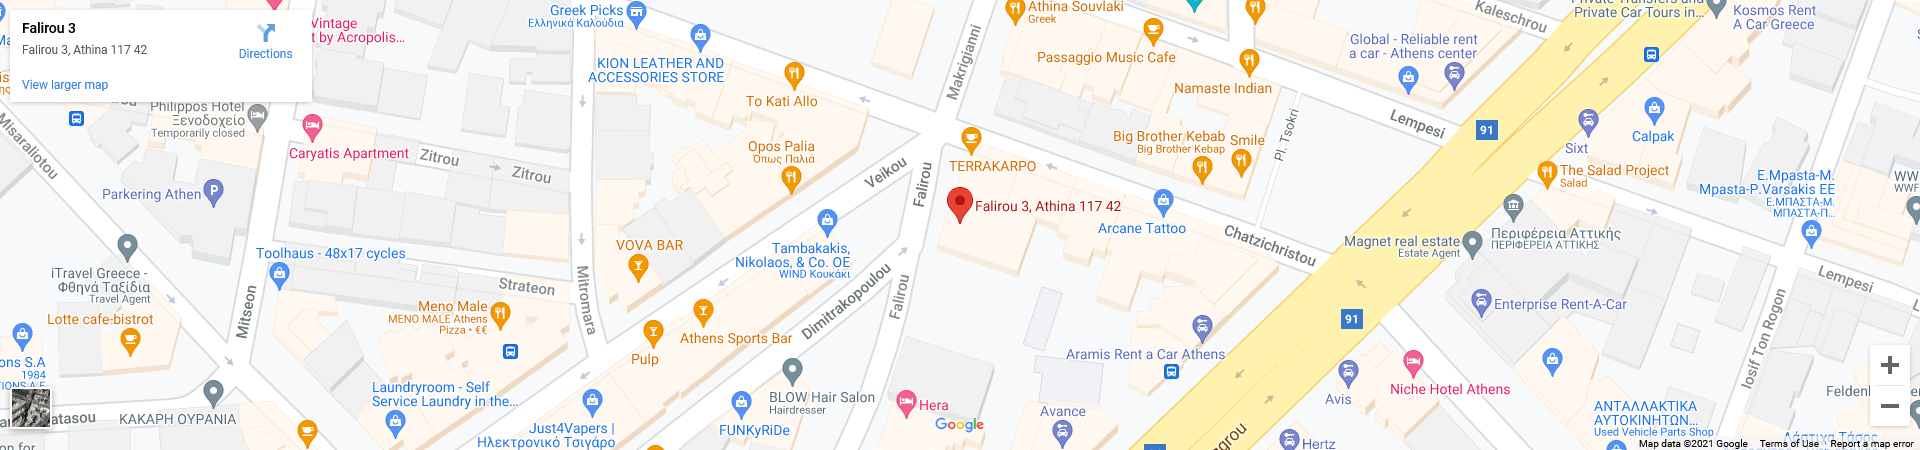 Acropolis View Deluxe Penthouse Luxury Apartments Travelvibes Google Maps